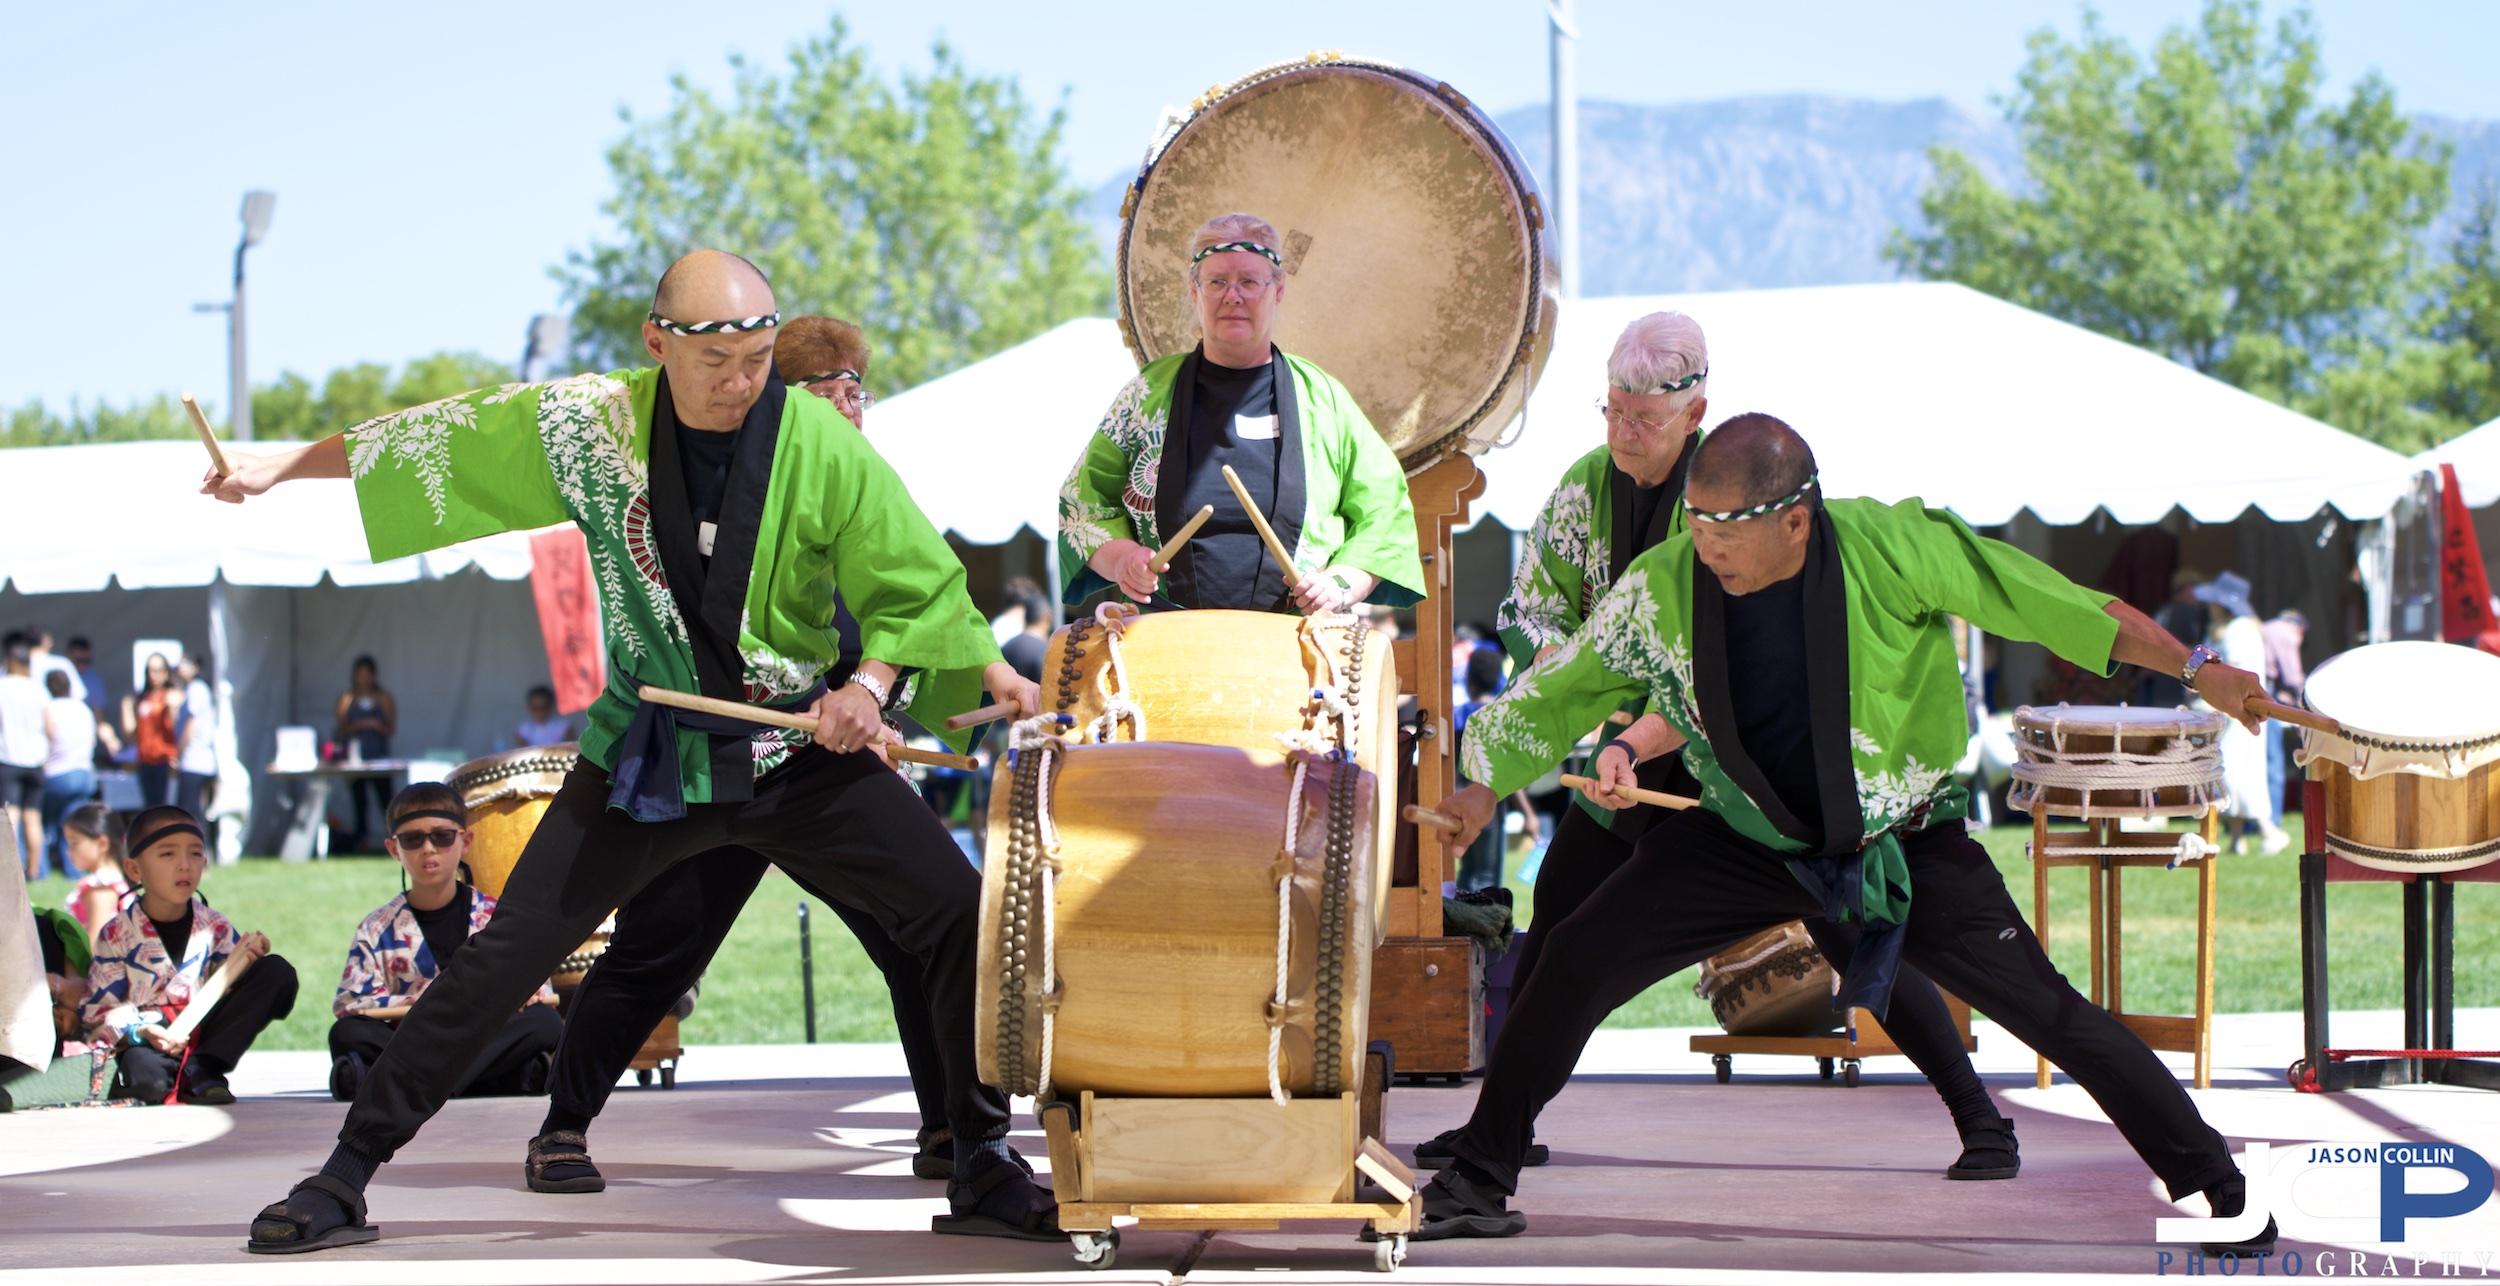 Taiko drumming at Aki Matsuri 2018 in Albuquerque, New Mexico